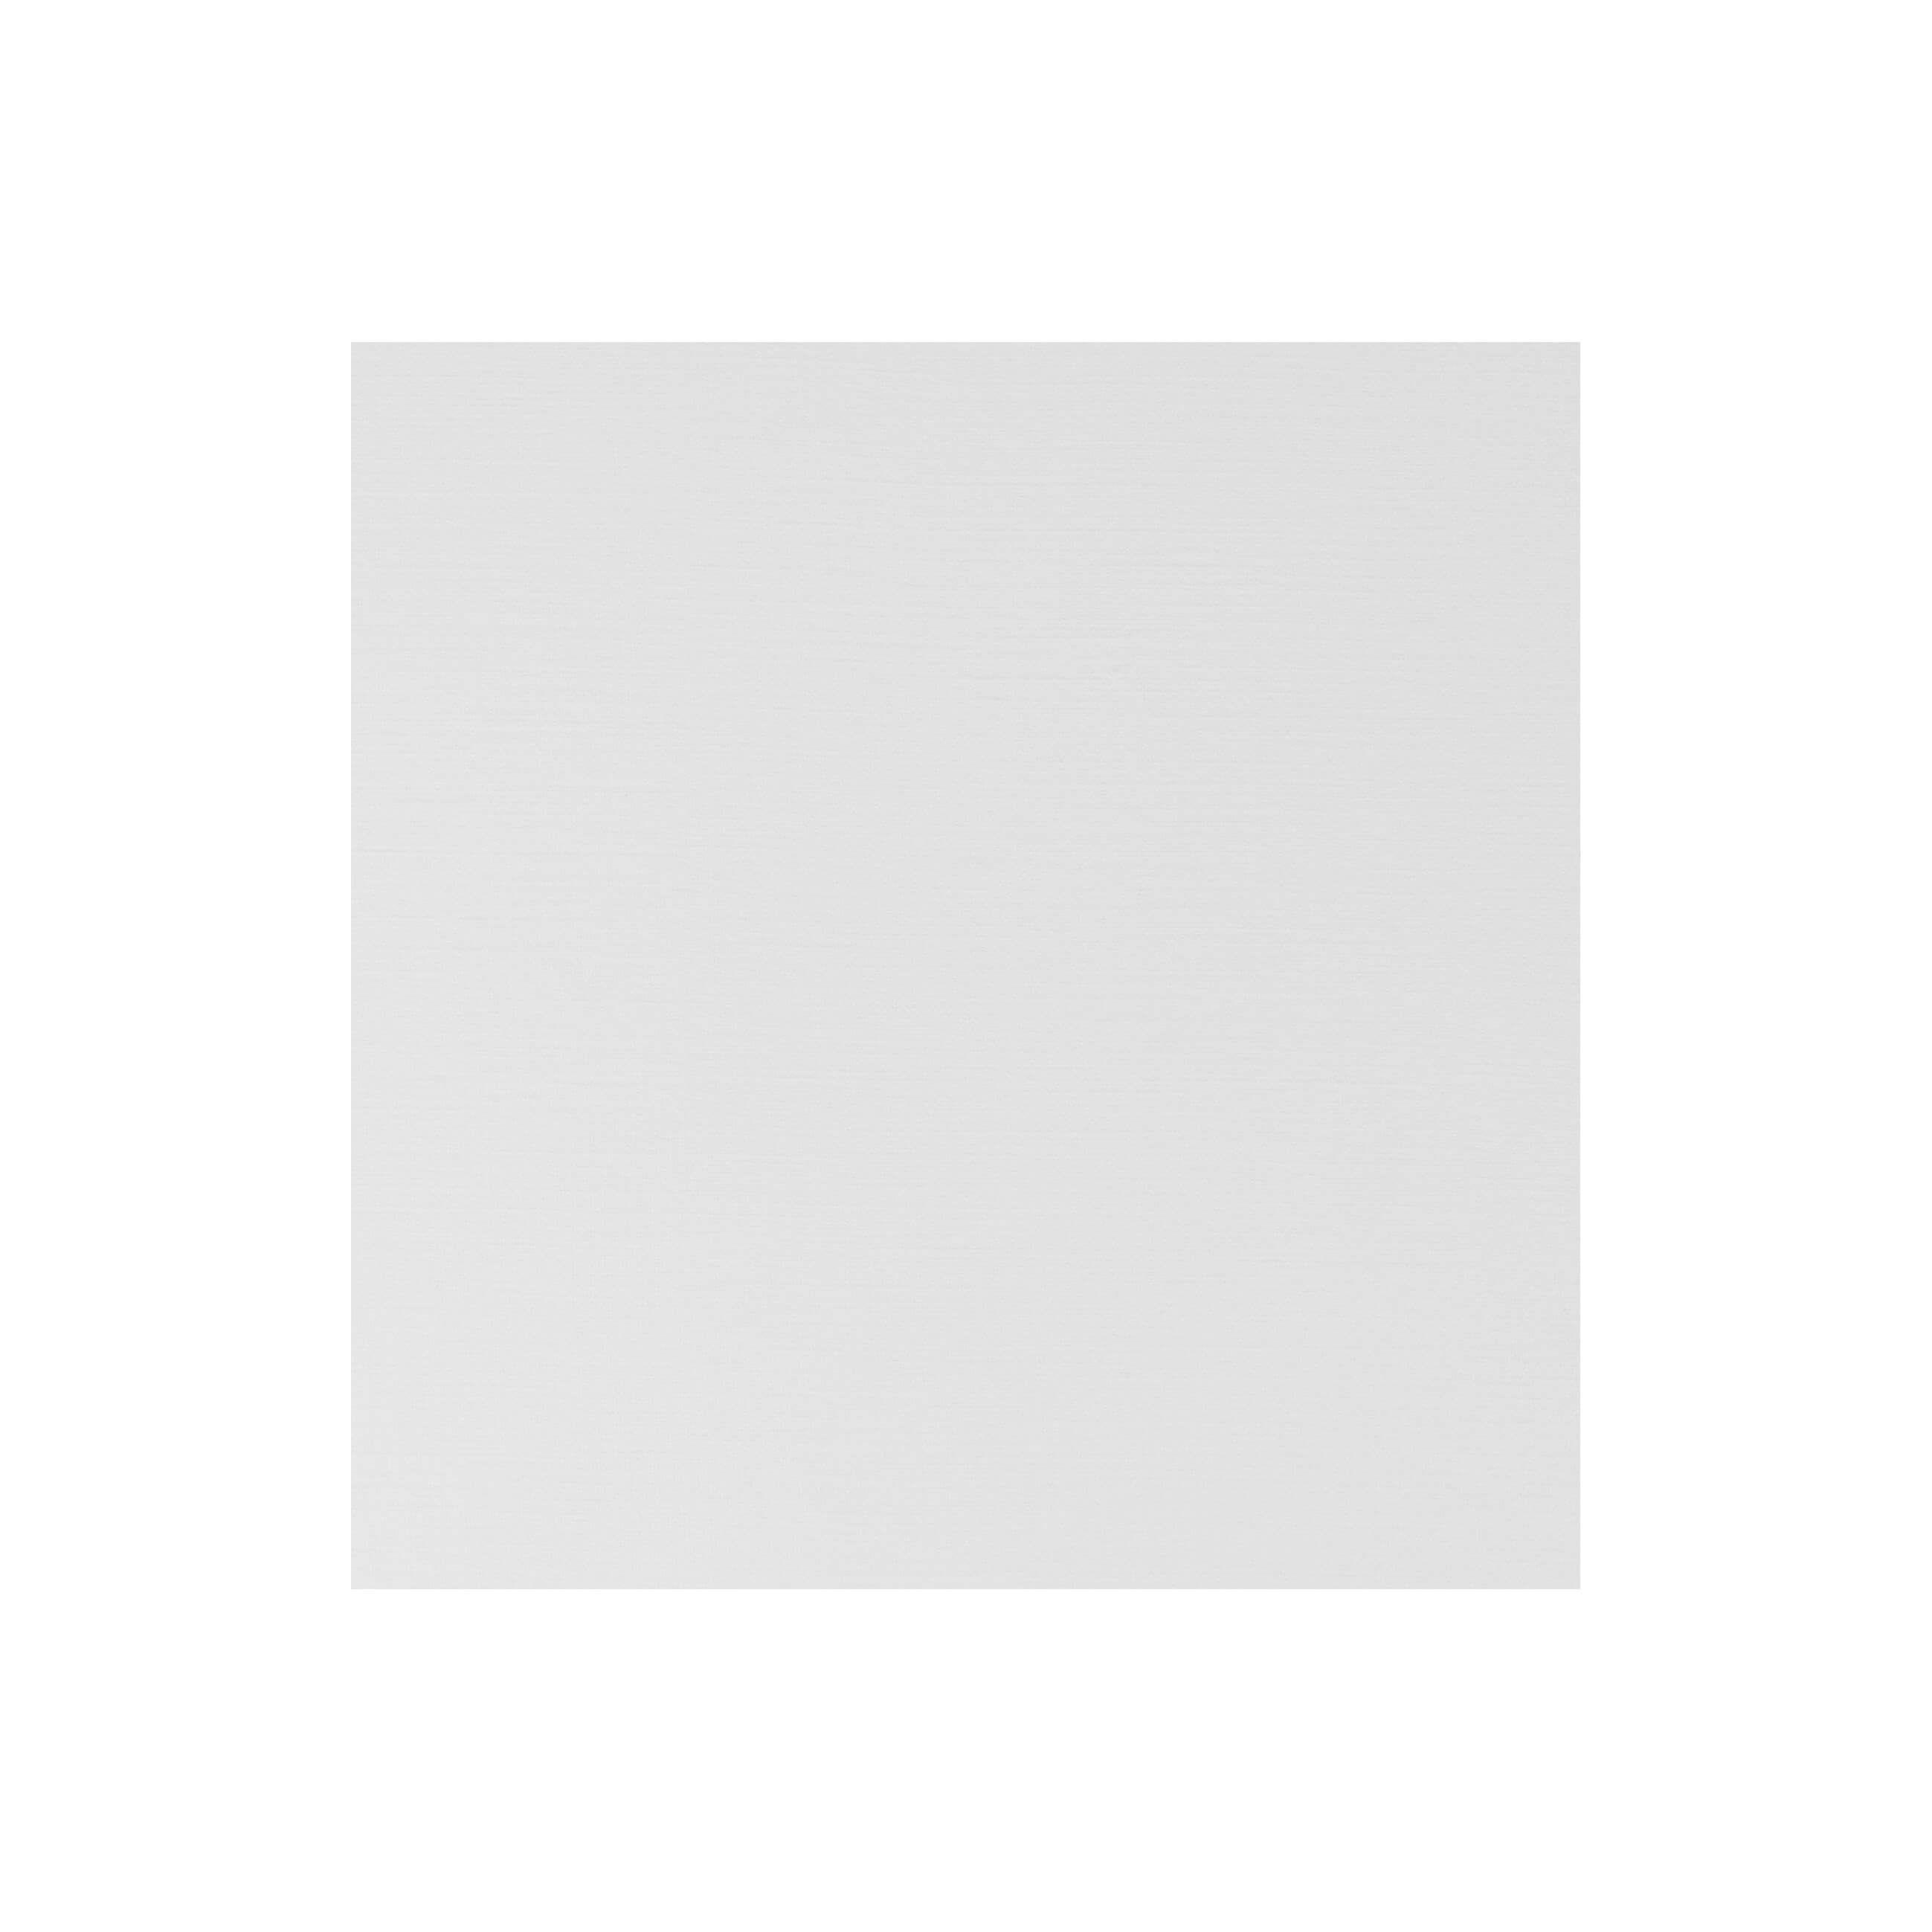 Enfolio Wallet 146mm Sq Cardpull Base - Silkweave White